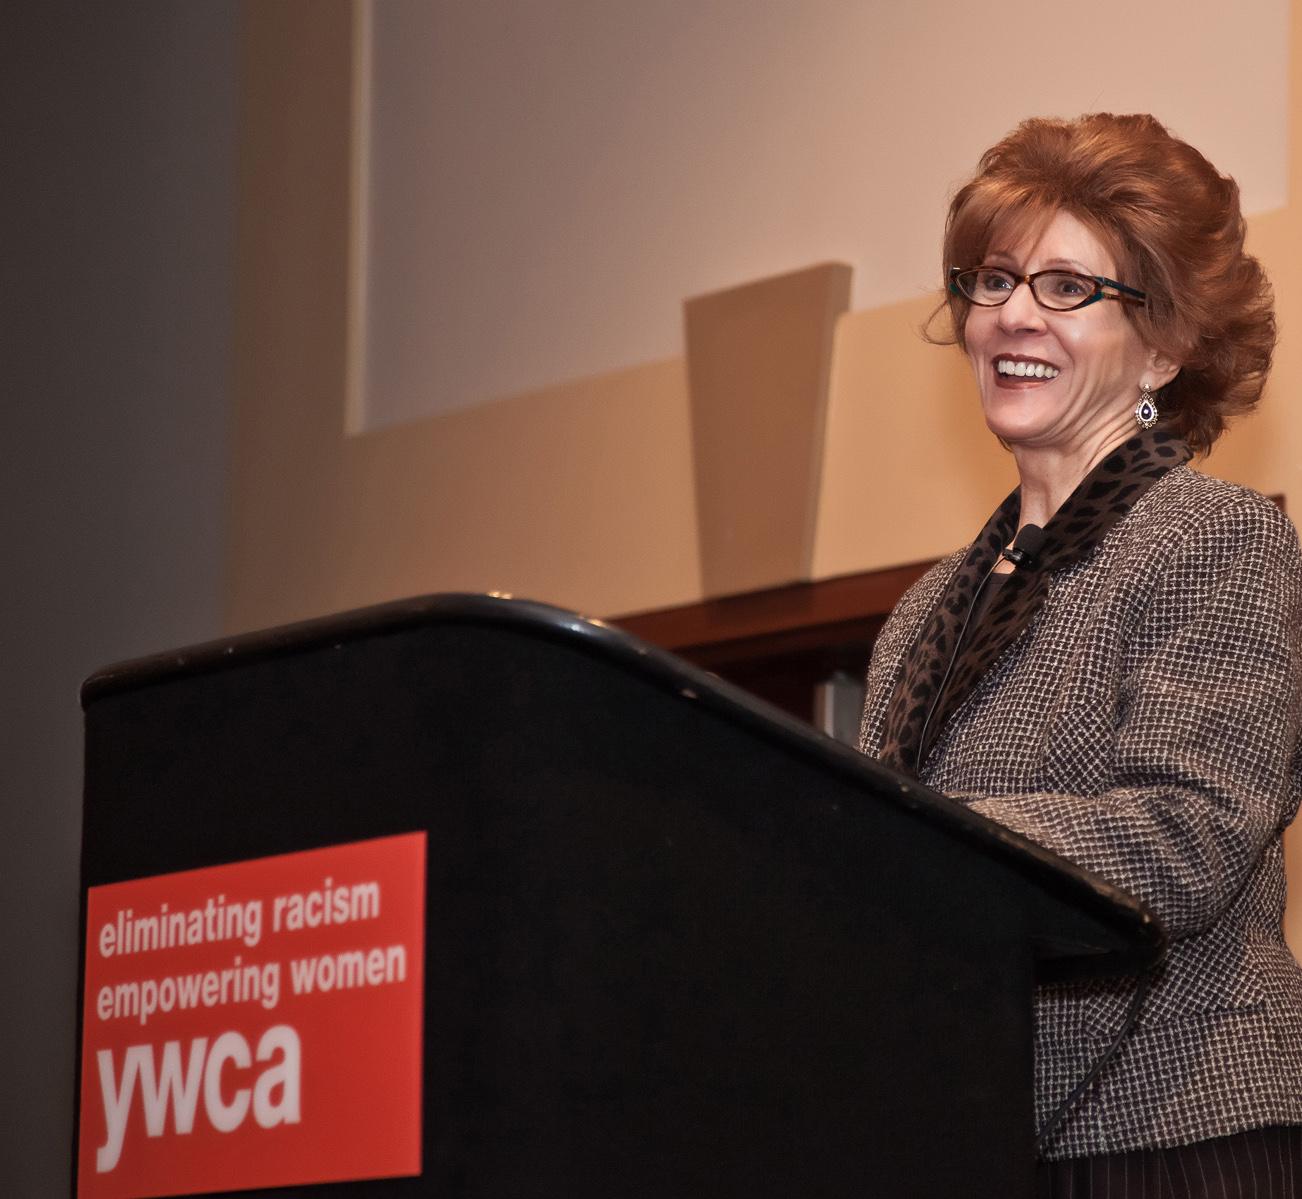 Sandra Ford Walston